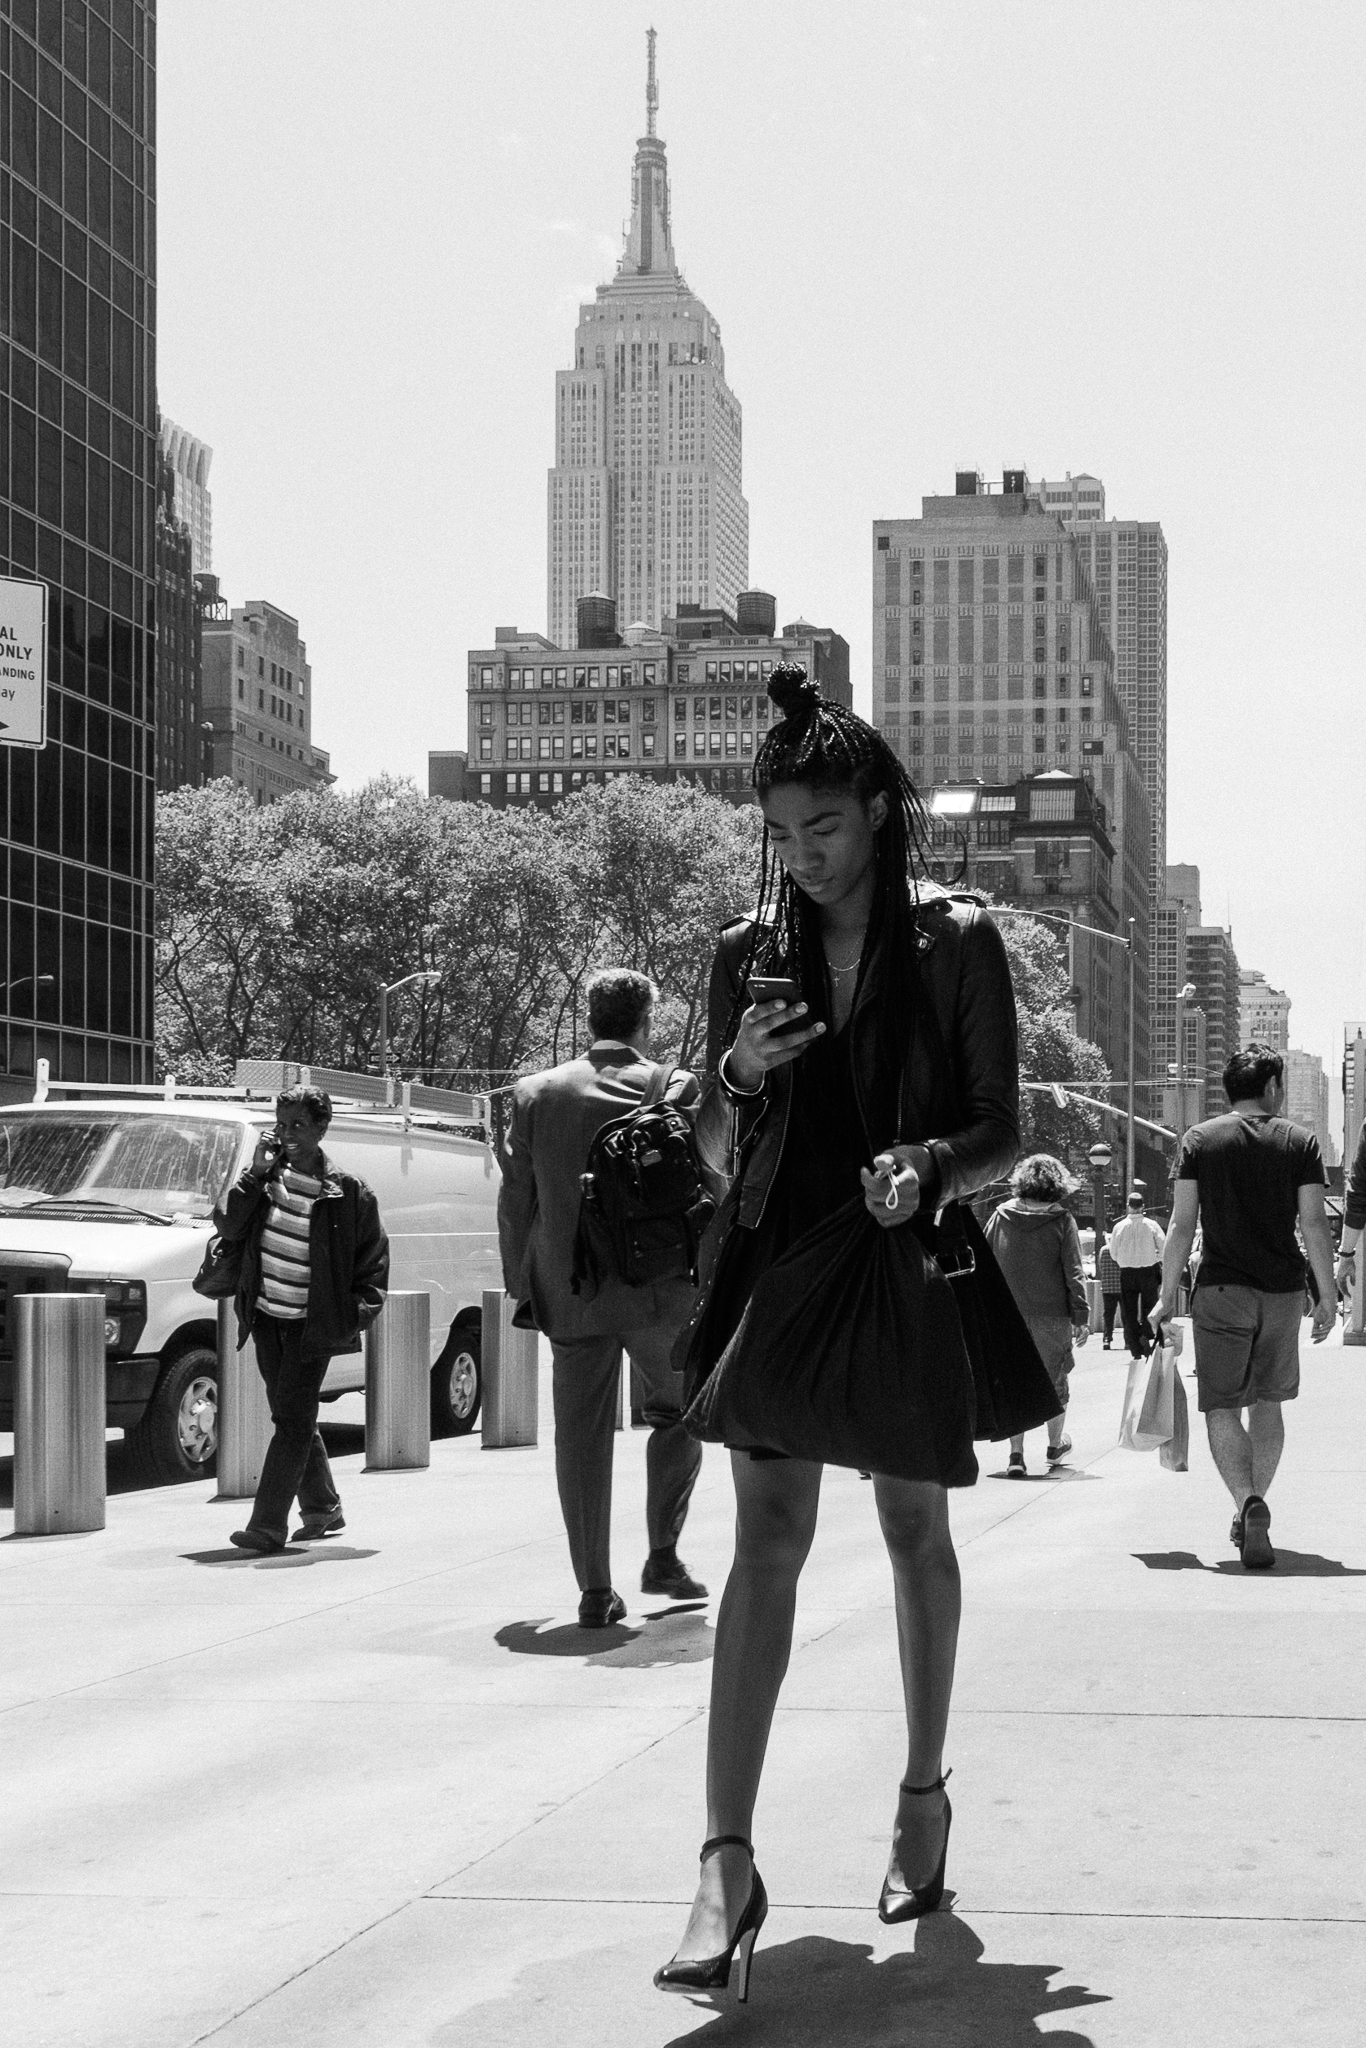 2015-05-14-NYC-0253.jpg